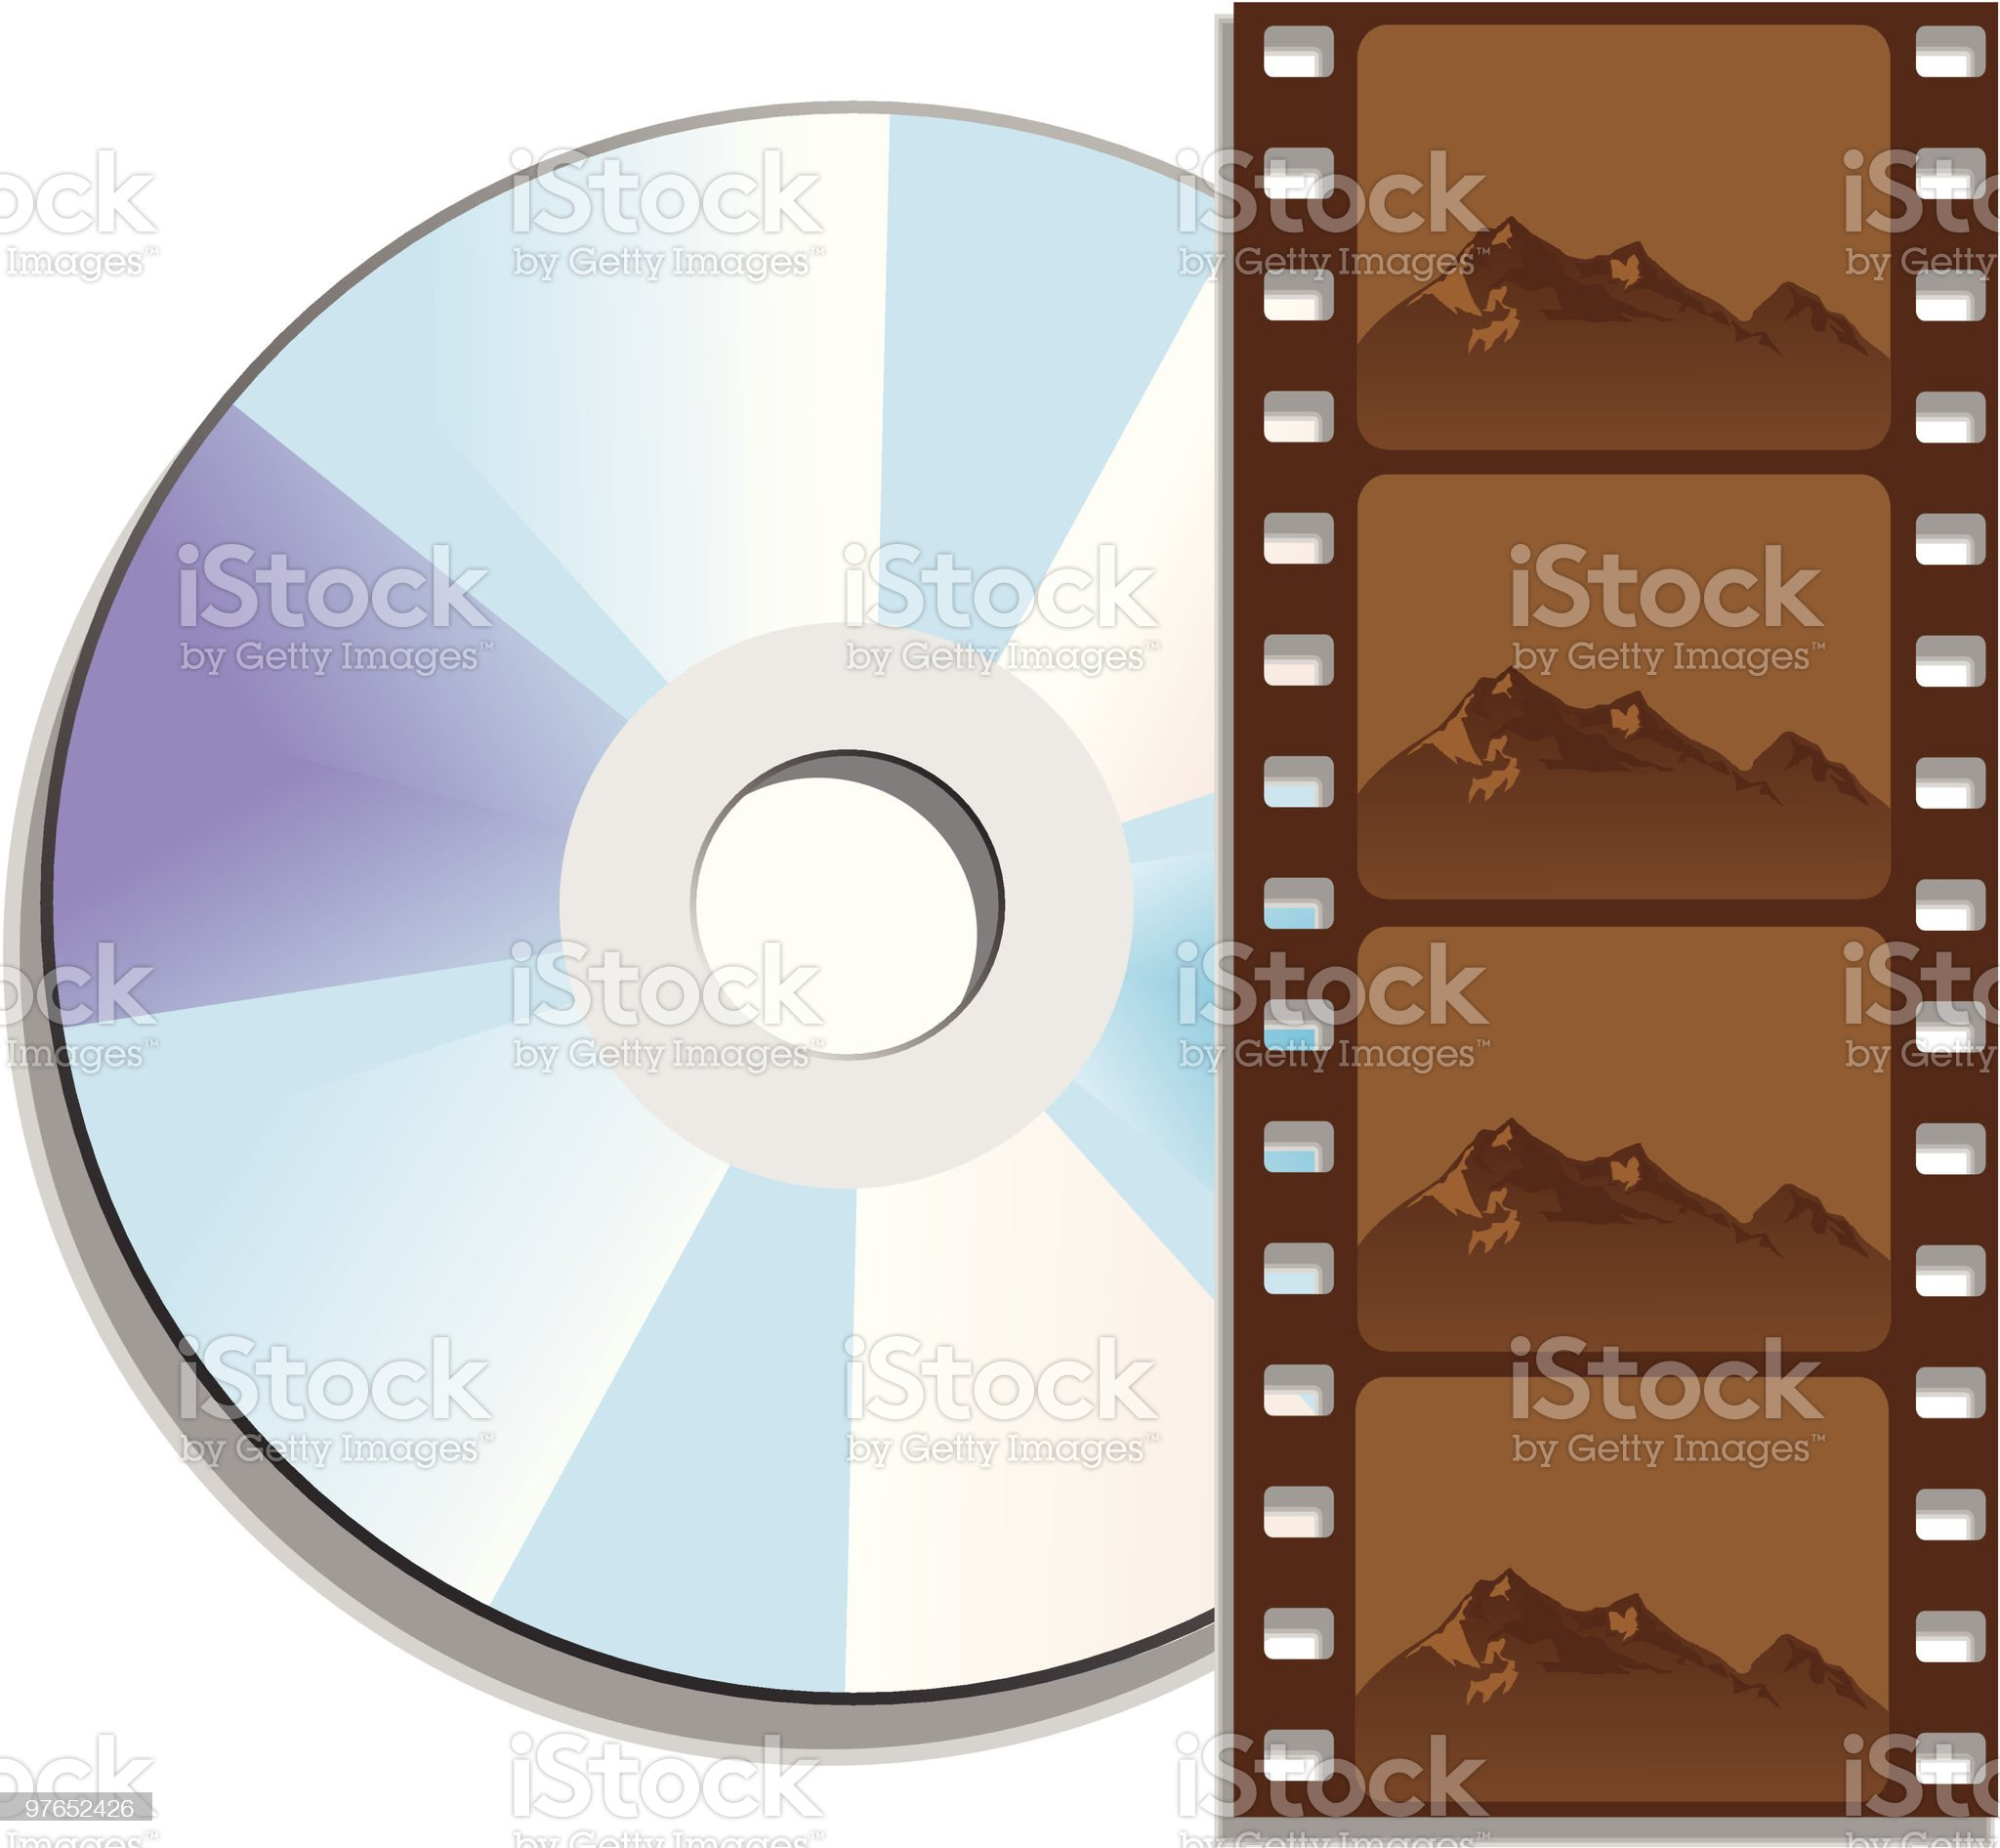 Movie on Digital Video Disk royalty-free stock vector art